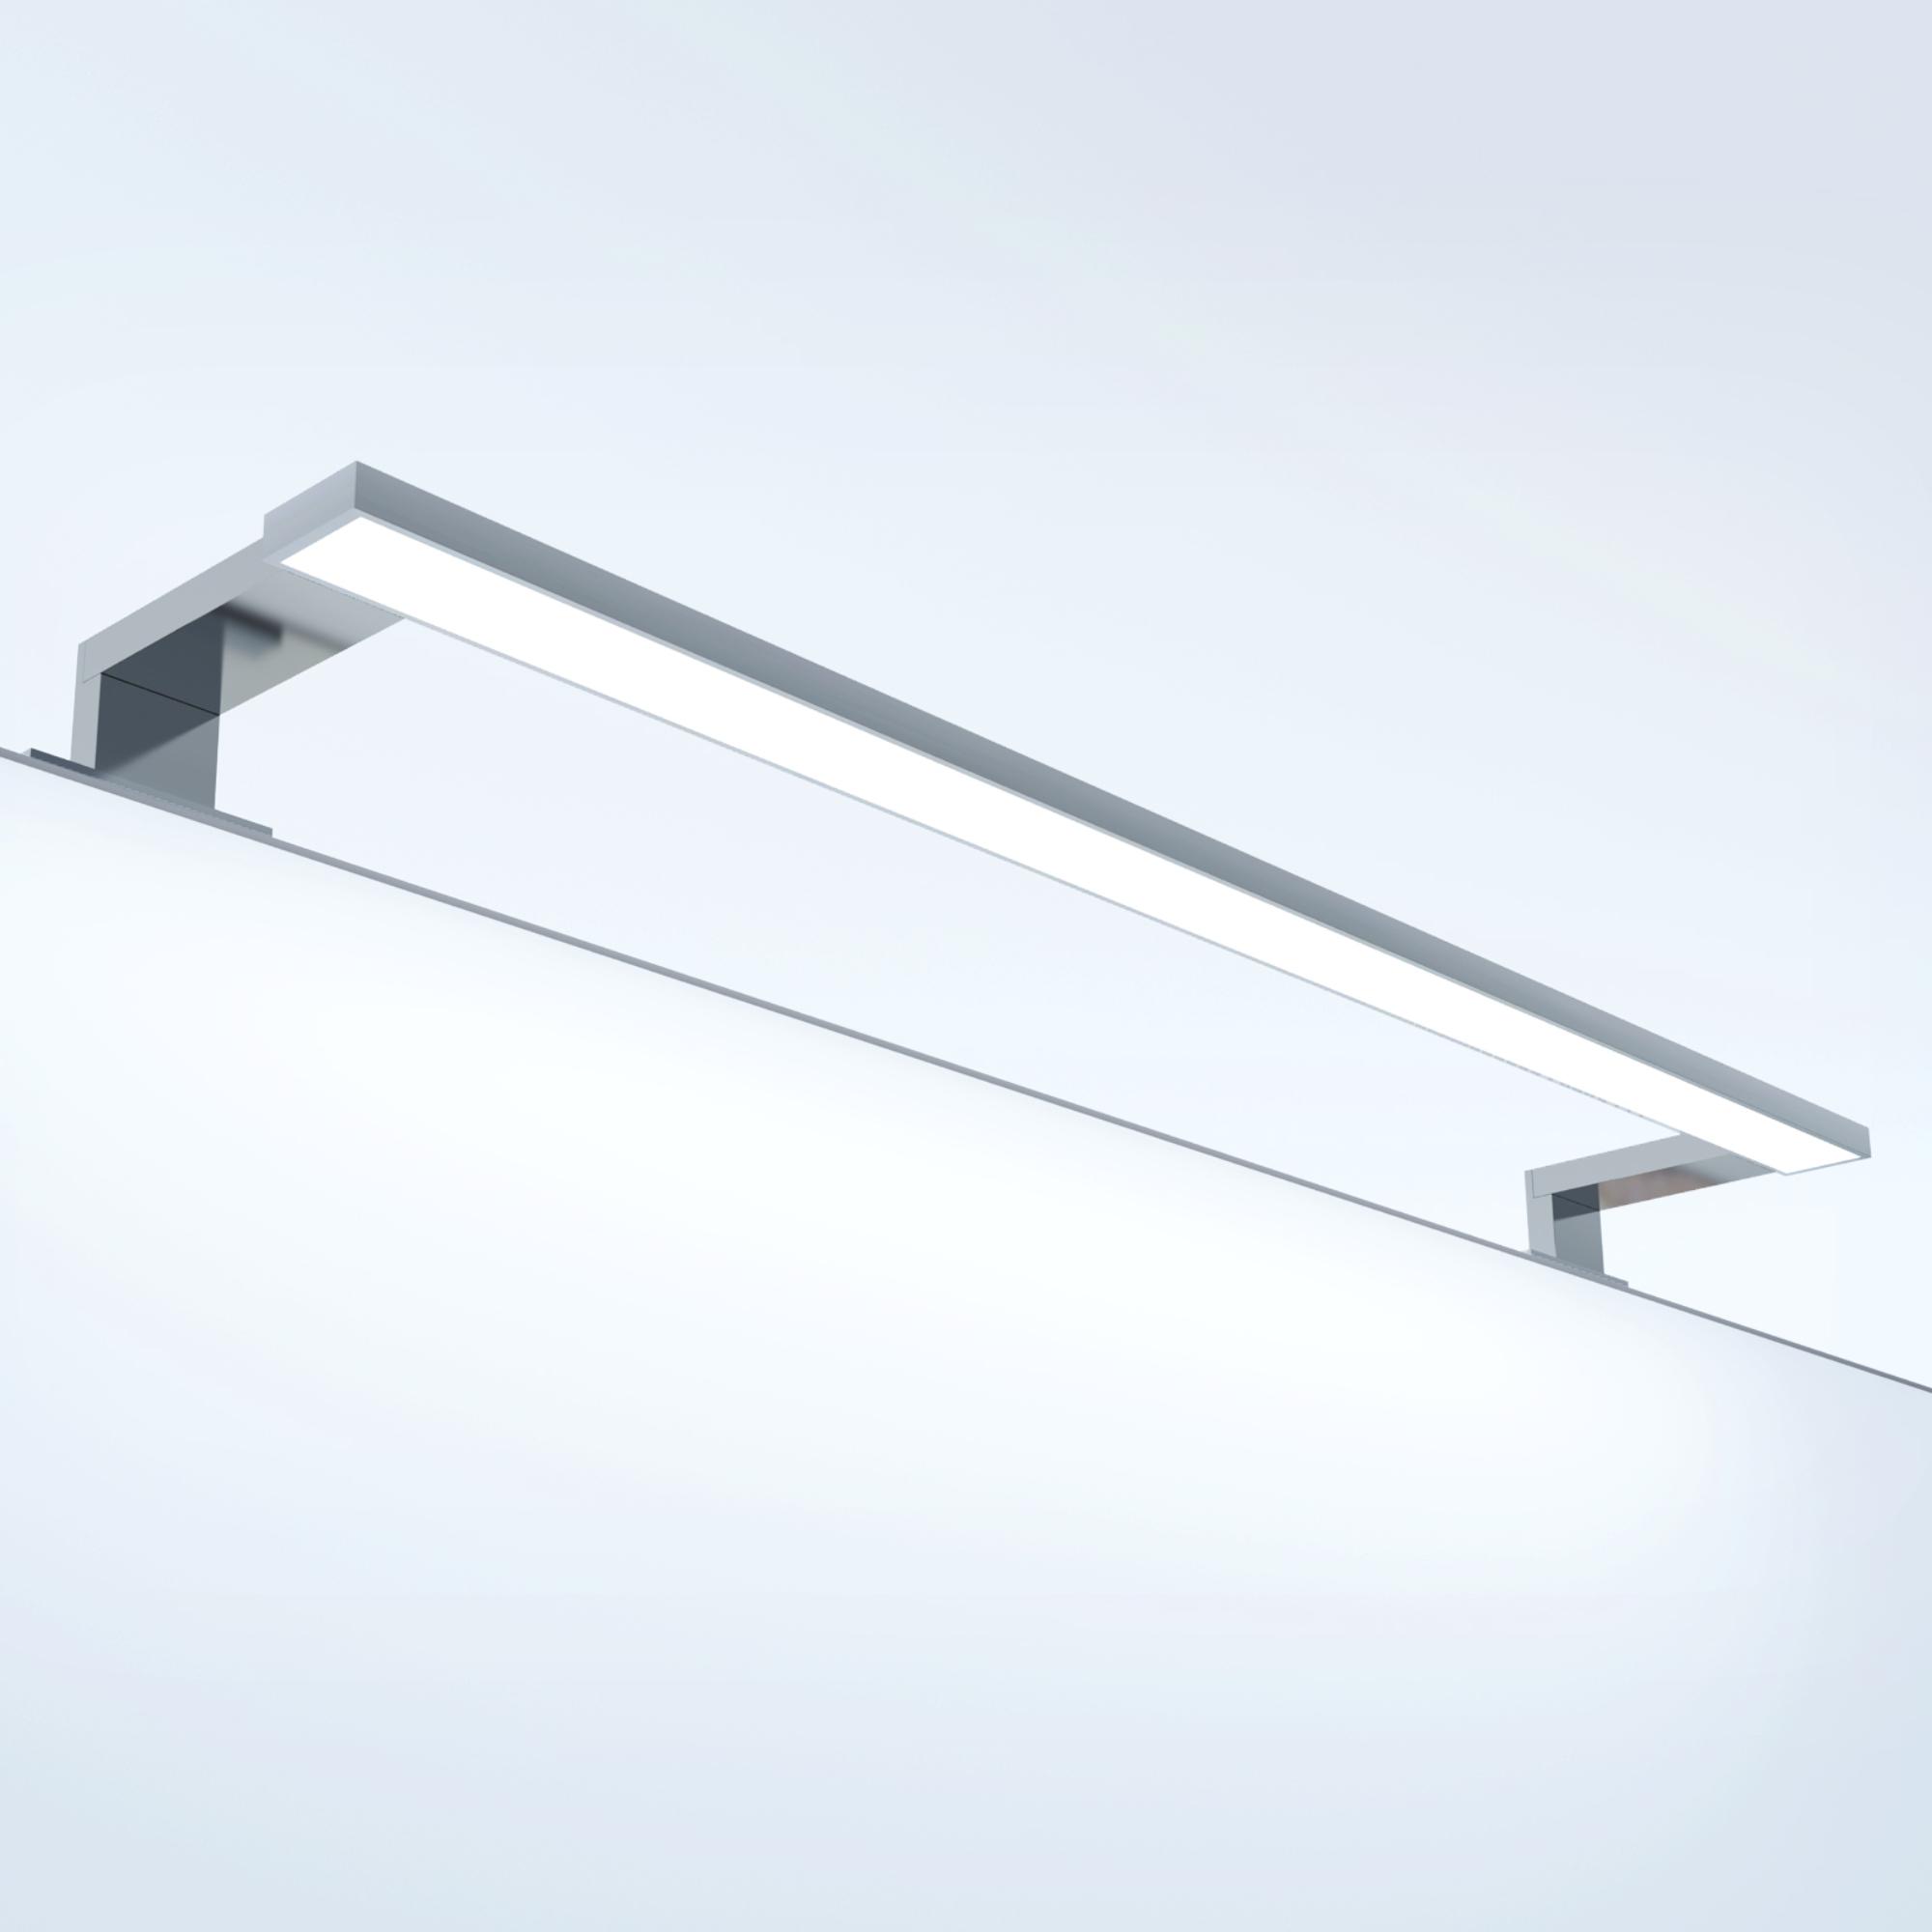 Mobel Salle De Bain construction kalb lampe miroir armoire material für möbel